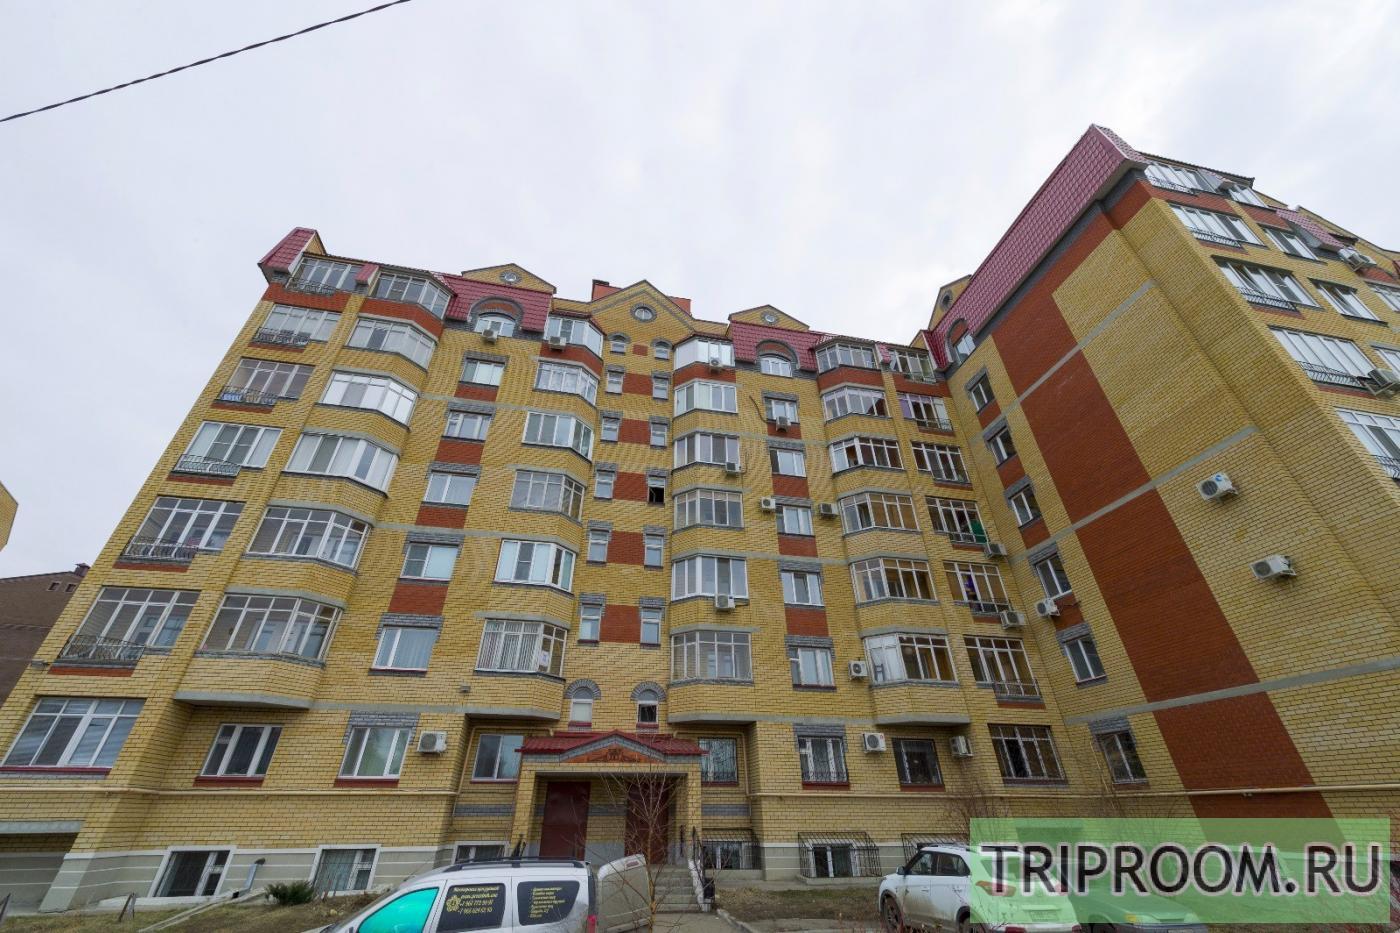 2-комнатная квартира посуточно (вариант № 2850), ул. Габдуллы Тукая улица, фото № 8